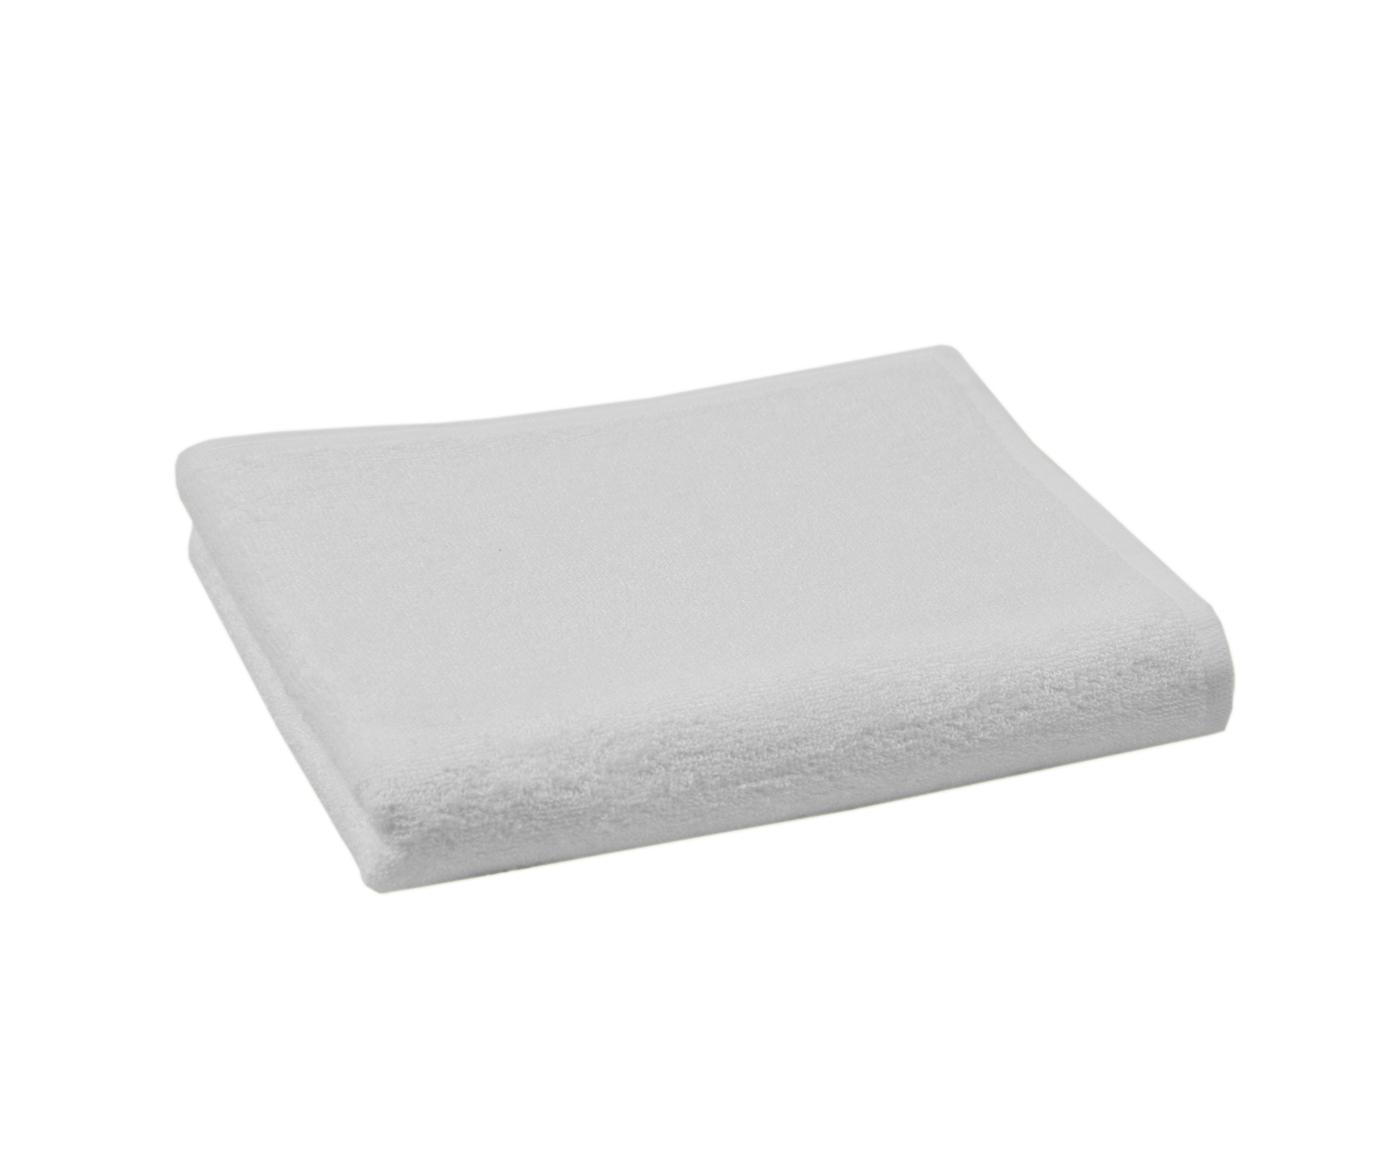 Полотенце 50x100 Hamam Qashmare белое